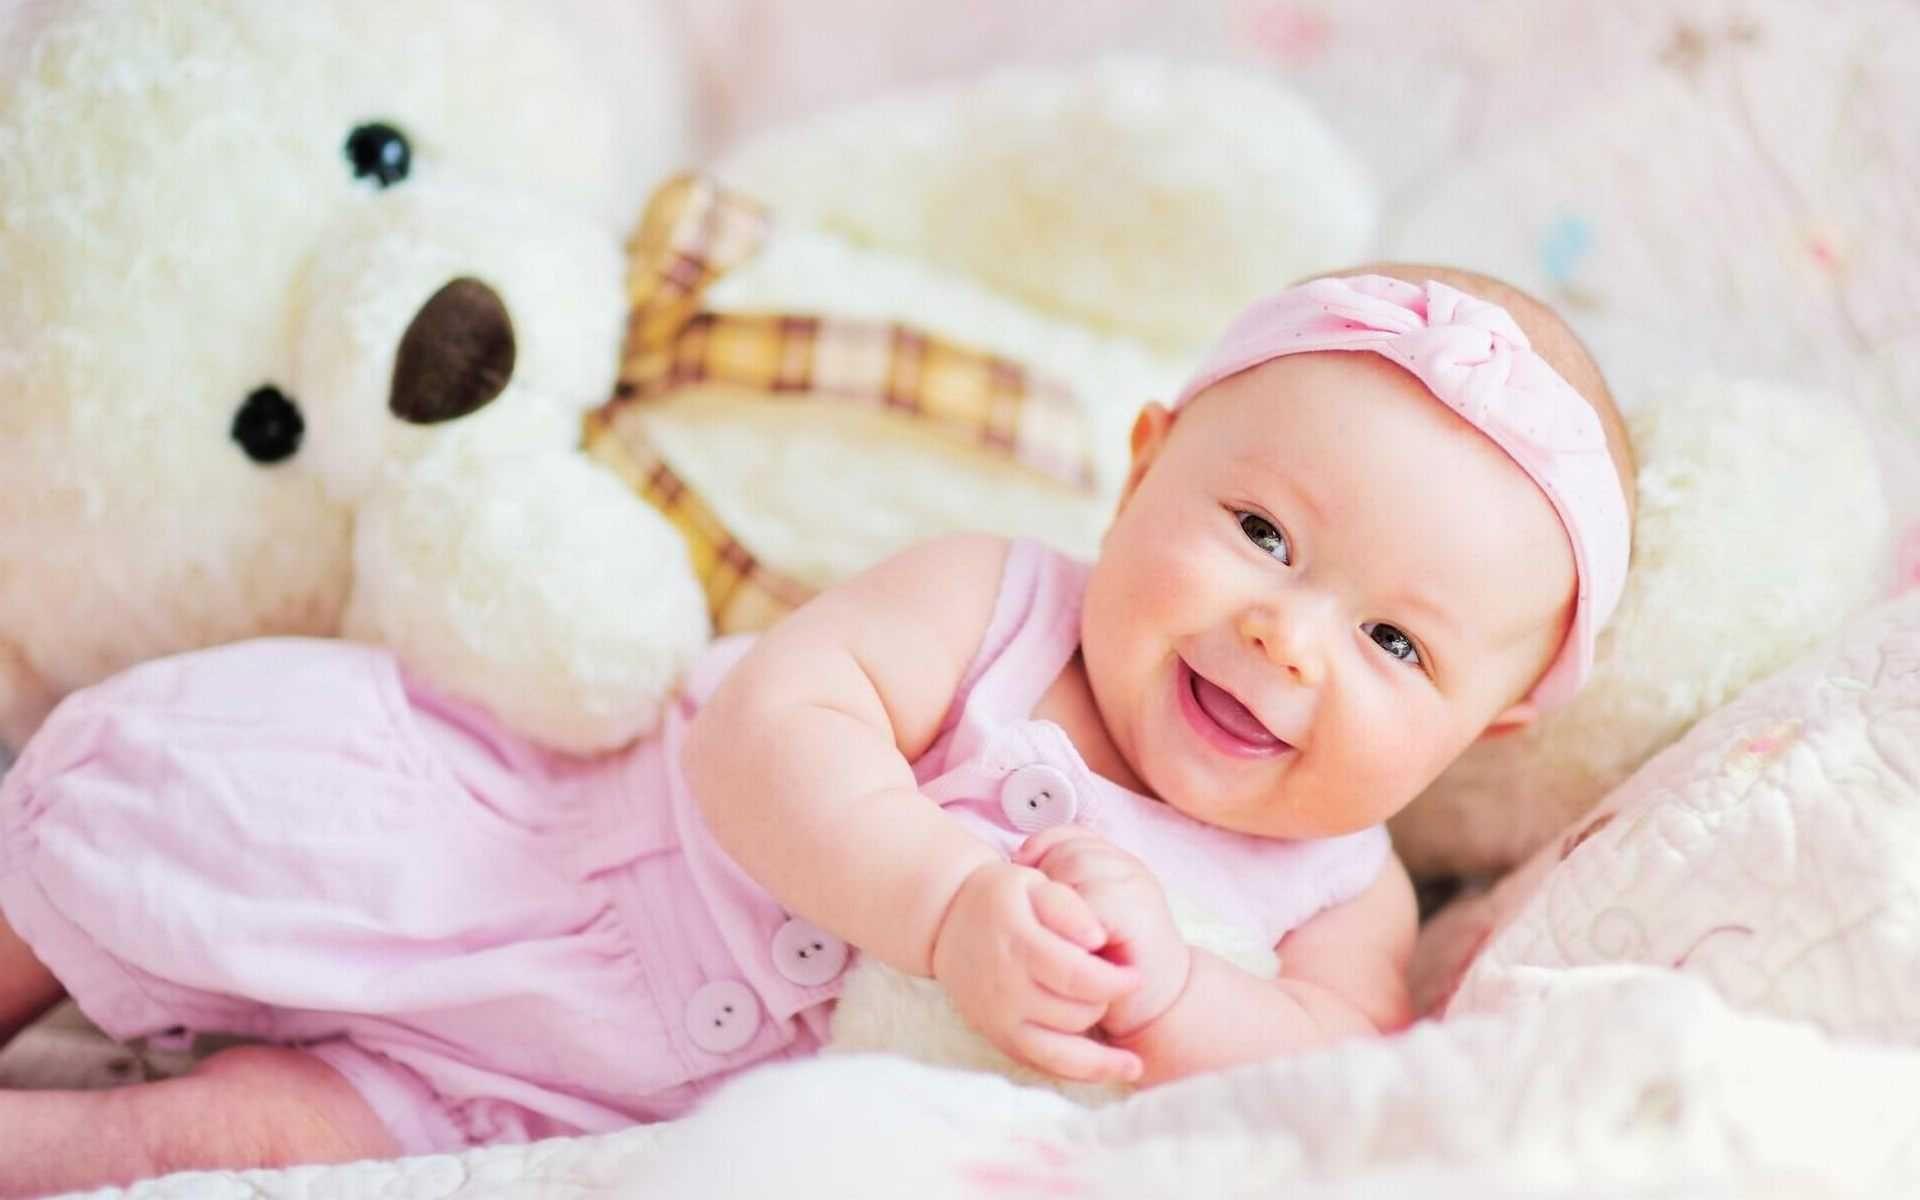 laughing baby wallpapers 1920×1200 laughing baby wallpapers (29